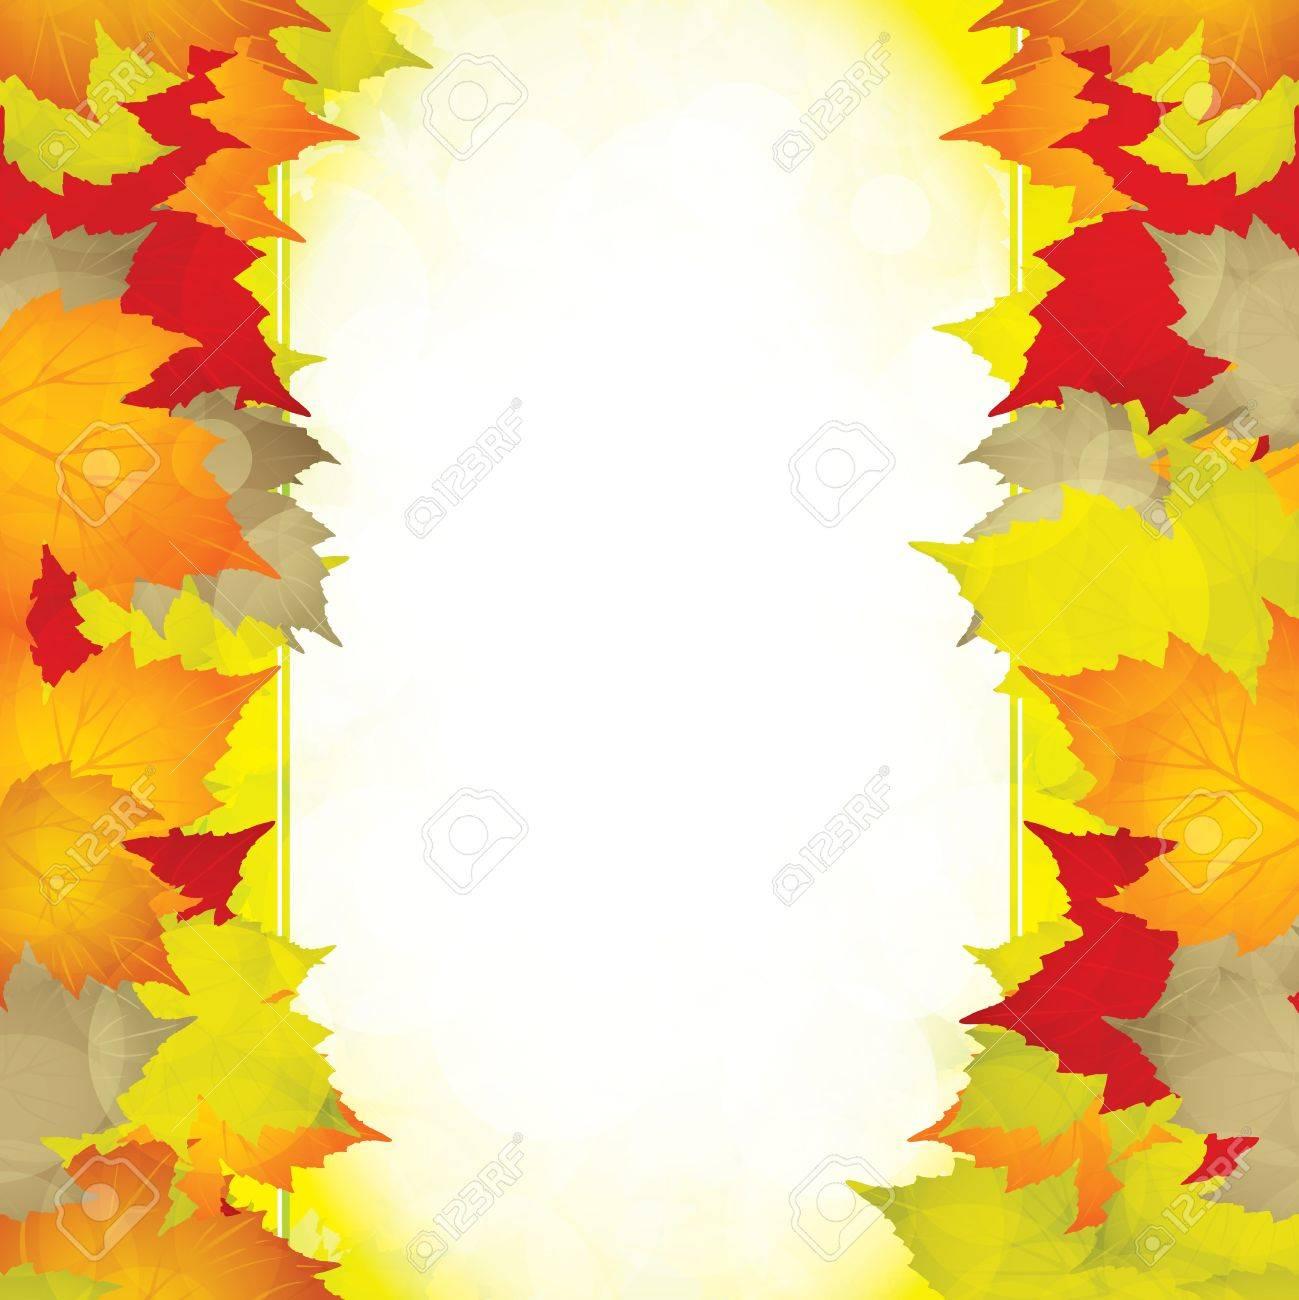 Autumn leaves frame.Vector Stock Vector - 10622287